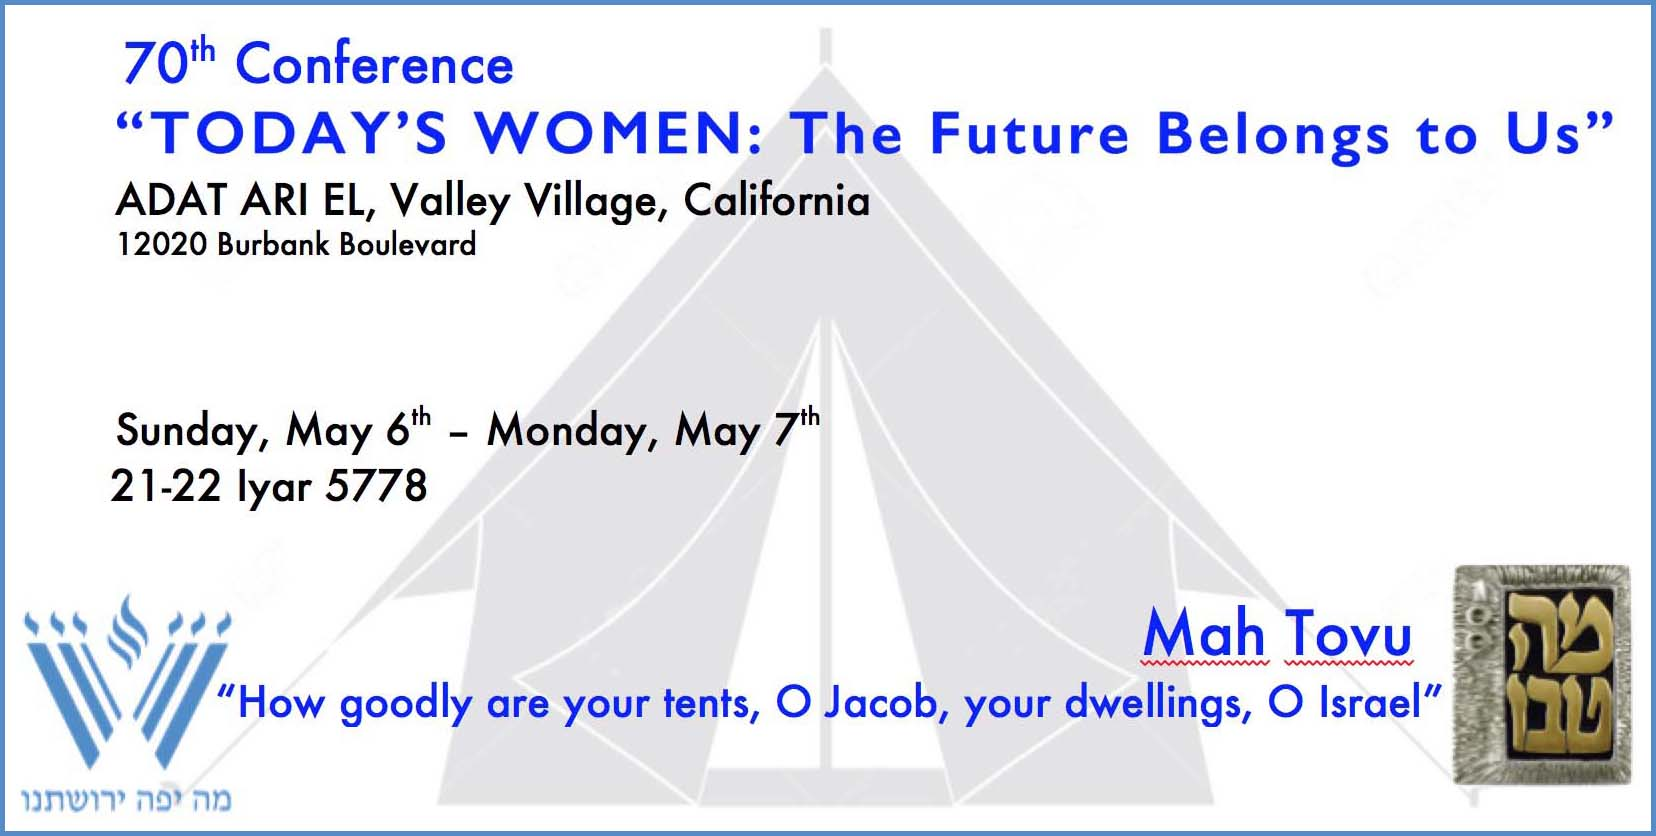 The Future Belongs to Us PSW Conference May 6 & 7, 2018 at Adat Ari El